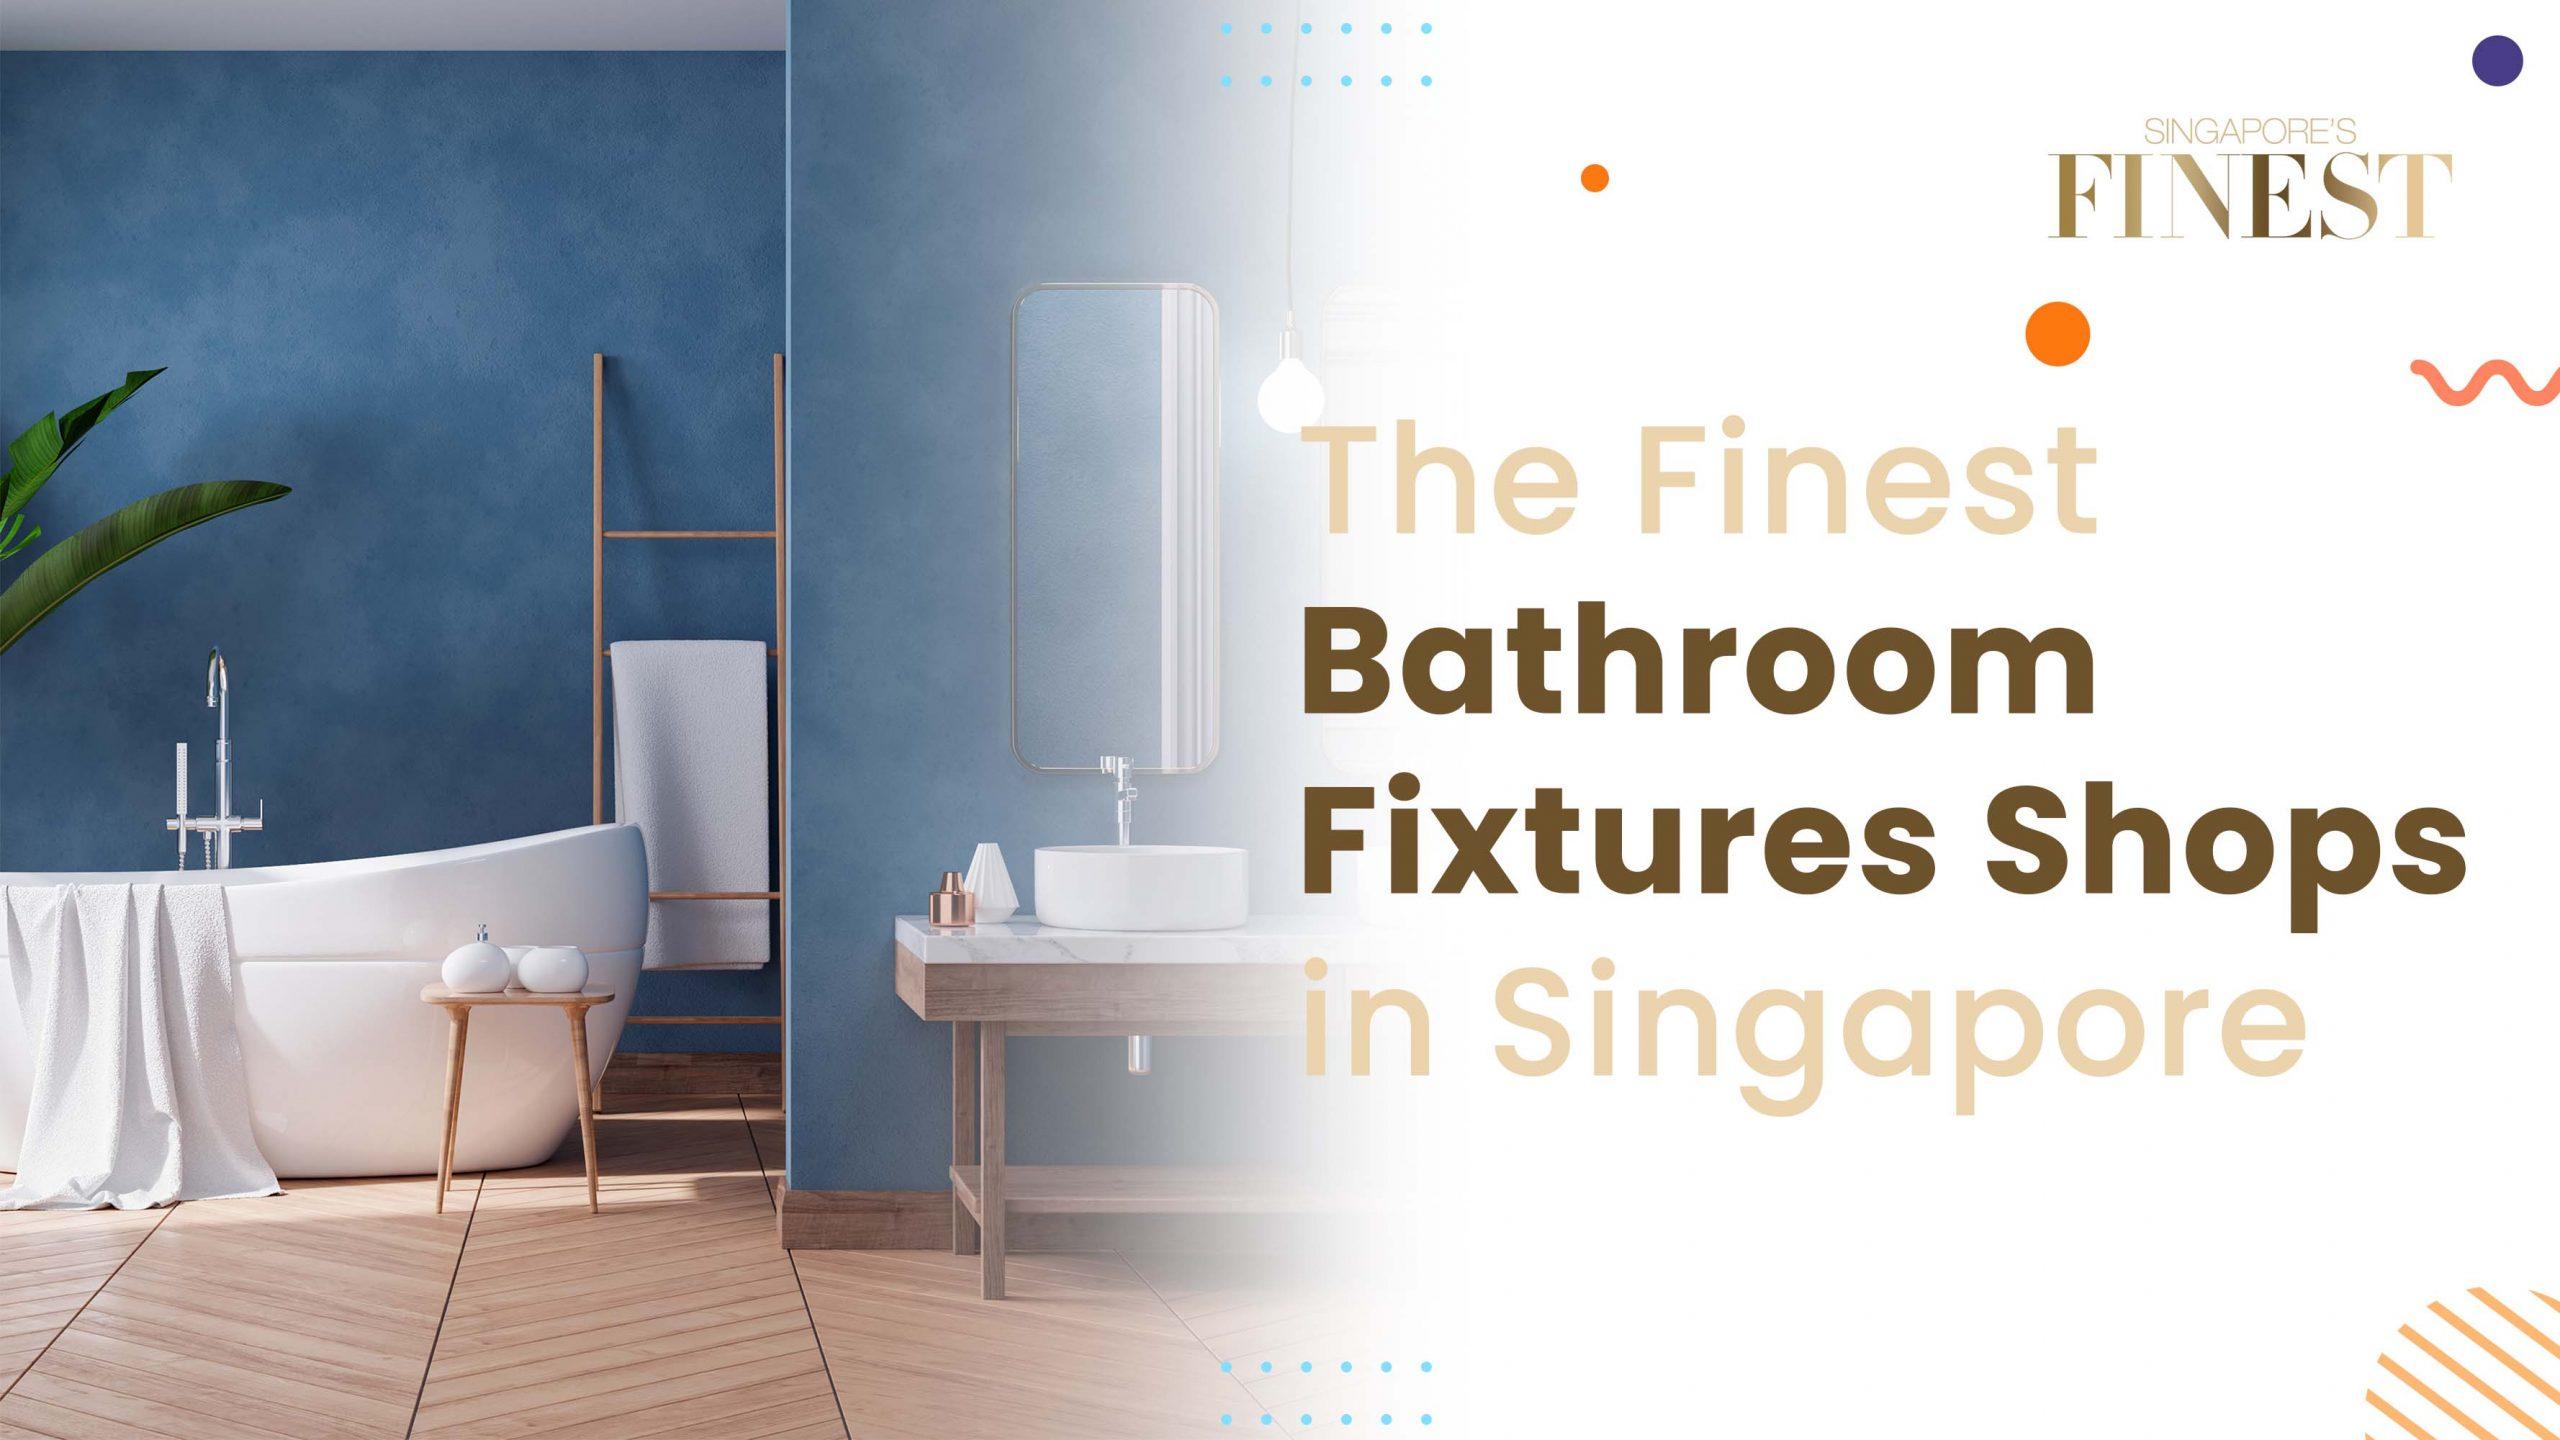 Finest Bathroom Fixtures Shops in Singapore